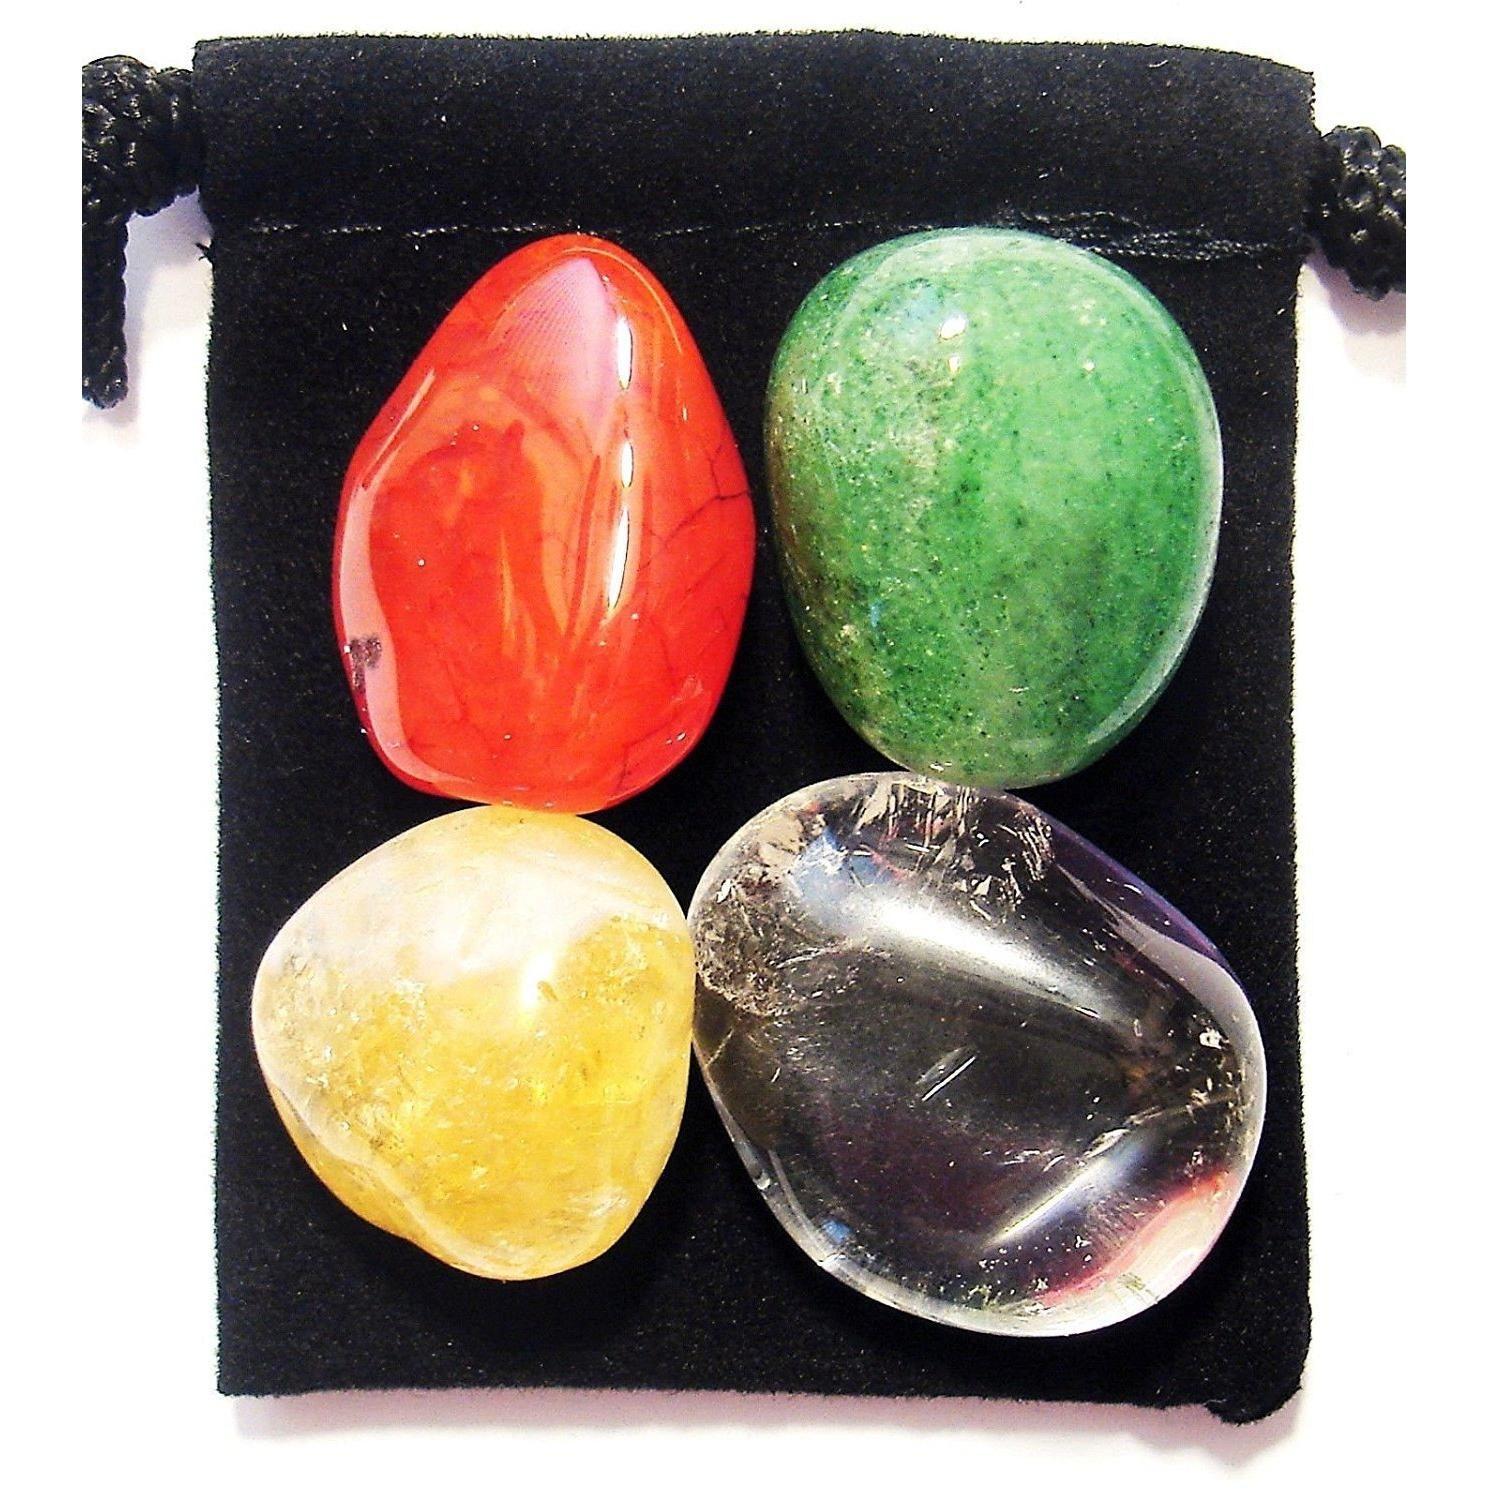 Pouch FERTILITY HELP Tumbled Crystal Healing Set = 4 Stones Description Card